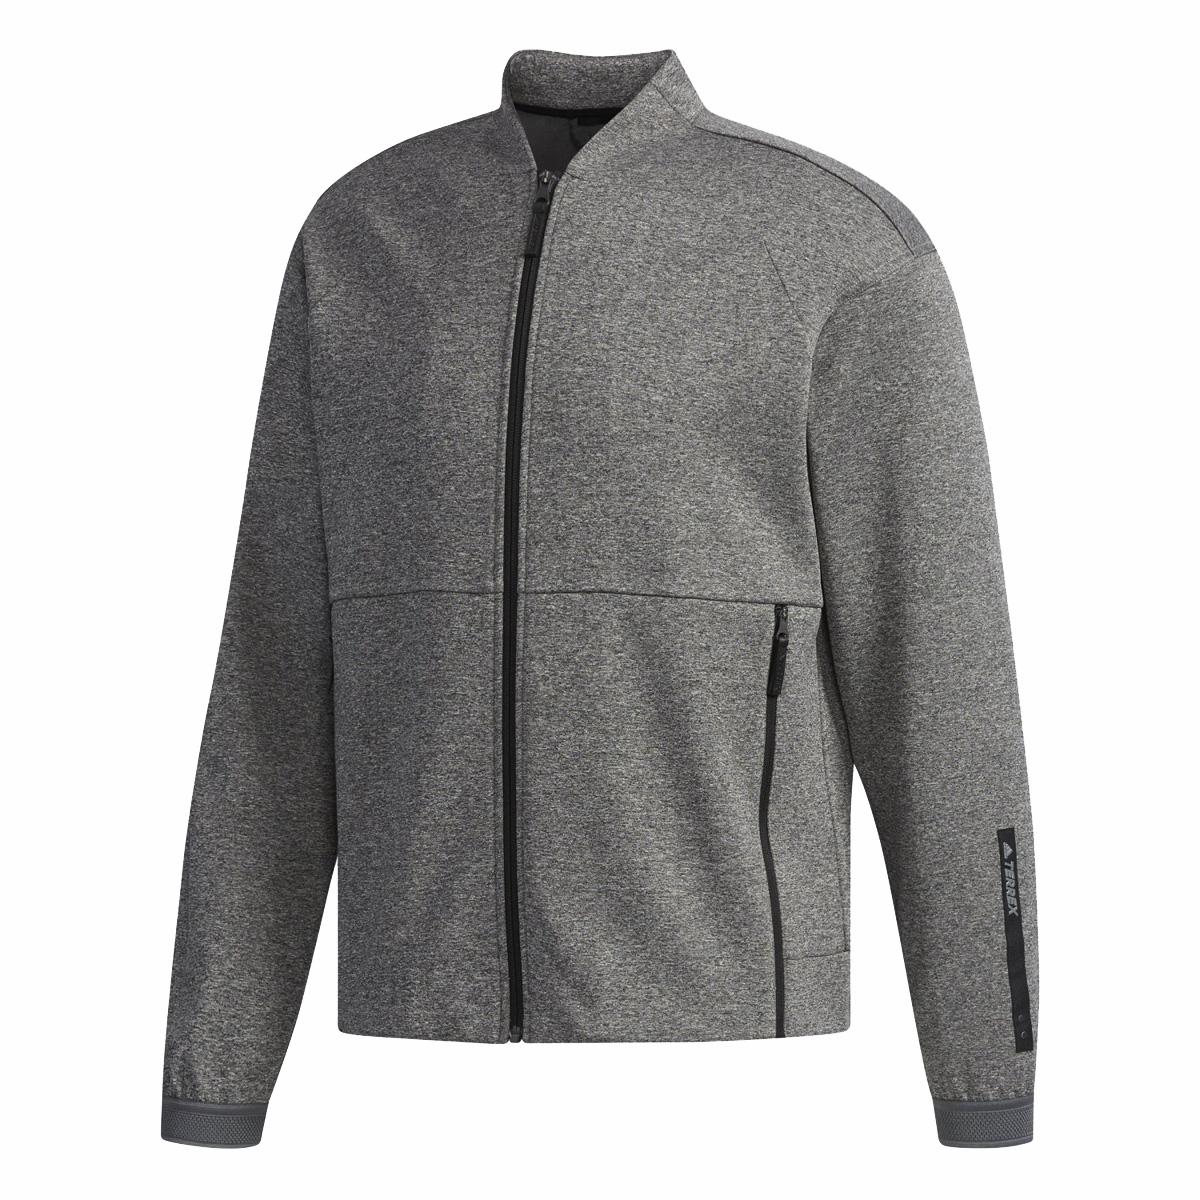 adidas CAP KNIT BOMBER(アディダス CAPニットボンバー)MEDIUM GREY HEATHER【メンズ ジャケット】18FW-I